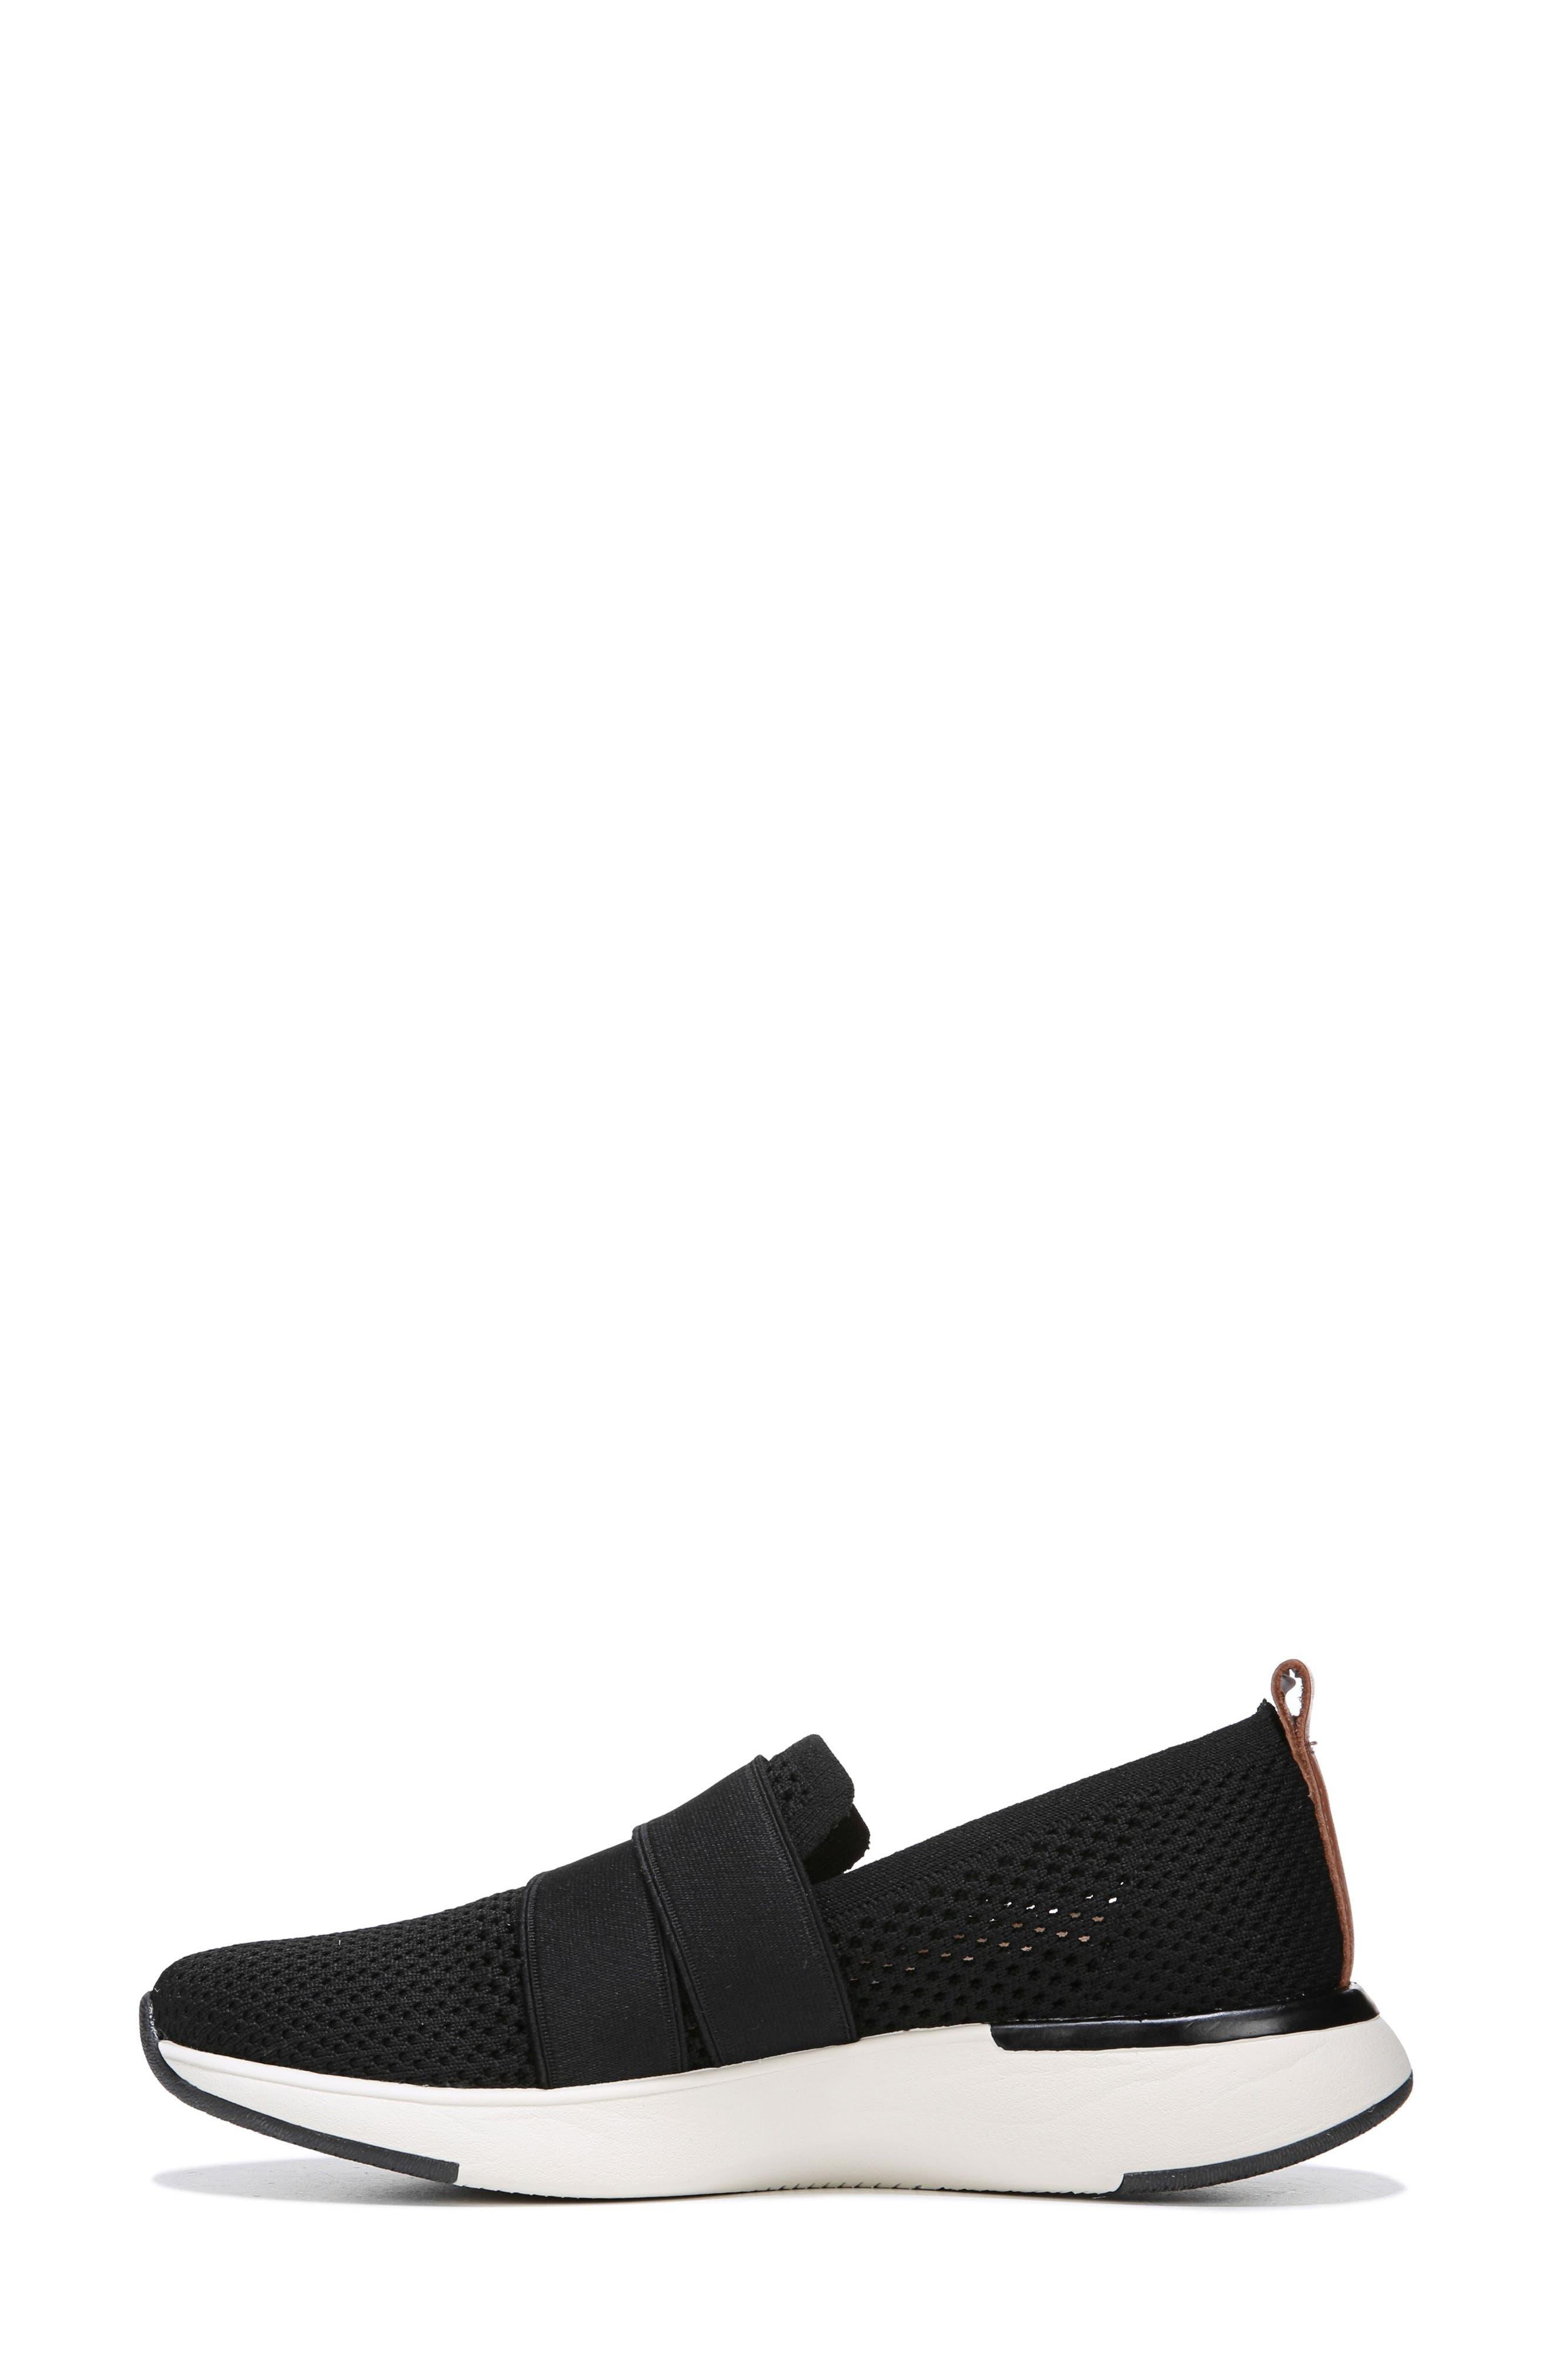 Slay All Day Sneaker,                             Alternate thumbnail 9, color,                             BLACK FABRIC